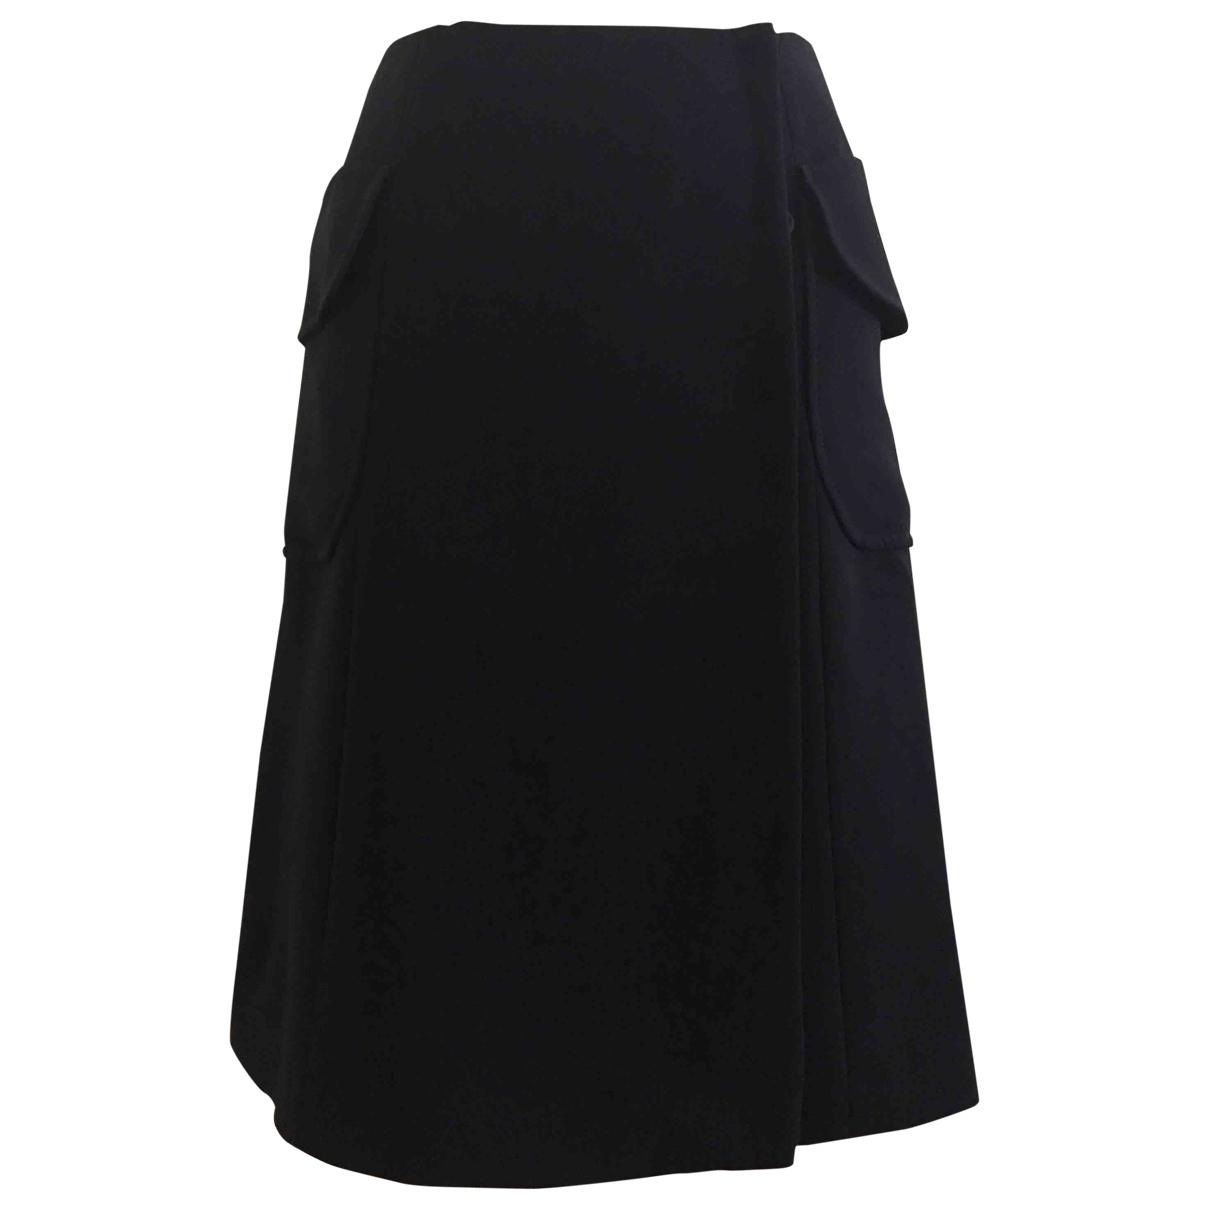 Miu Miu \N Black skirt for Women 38 EU